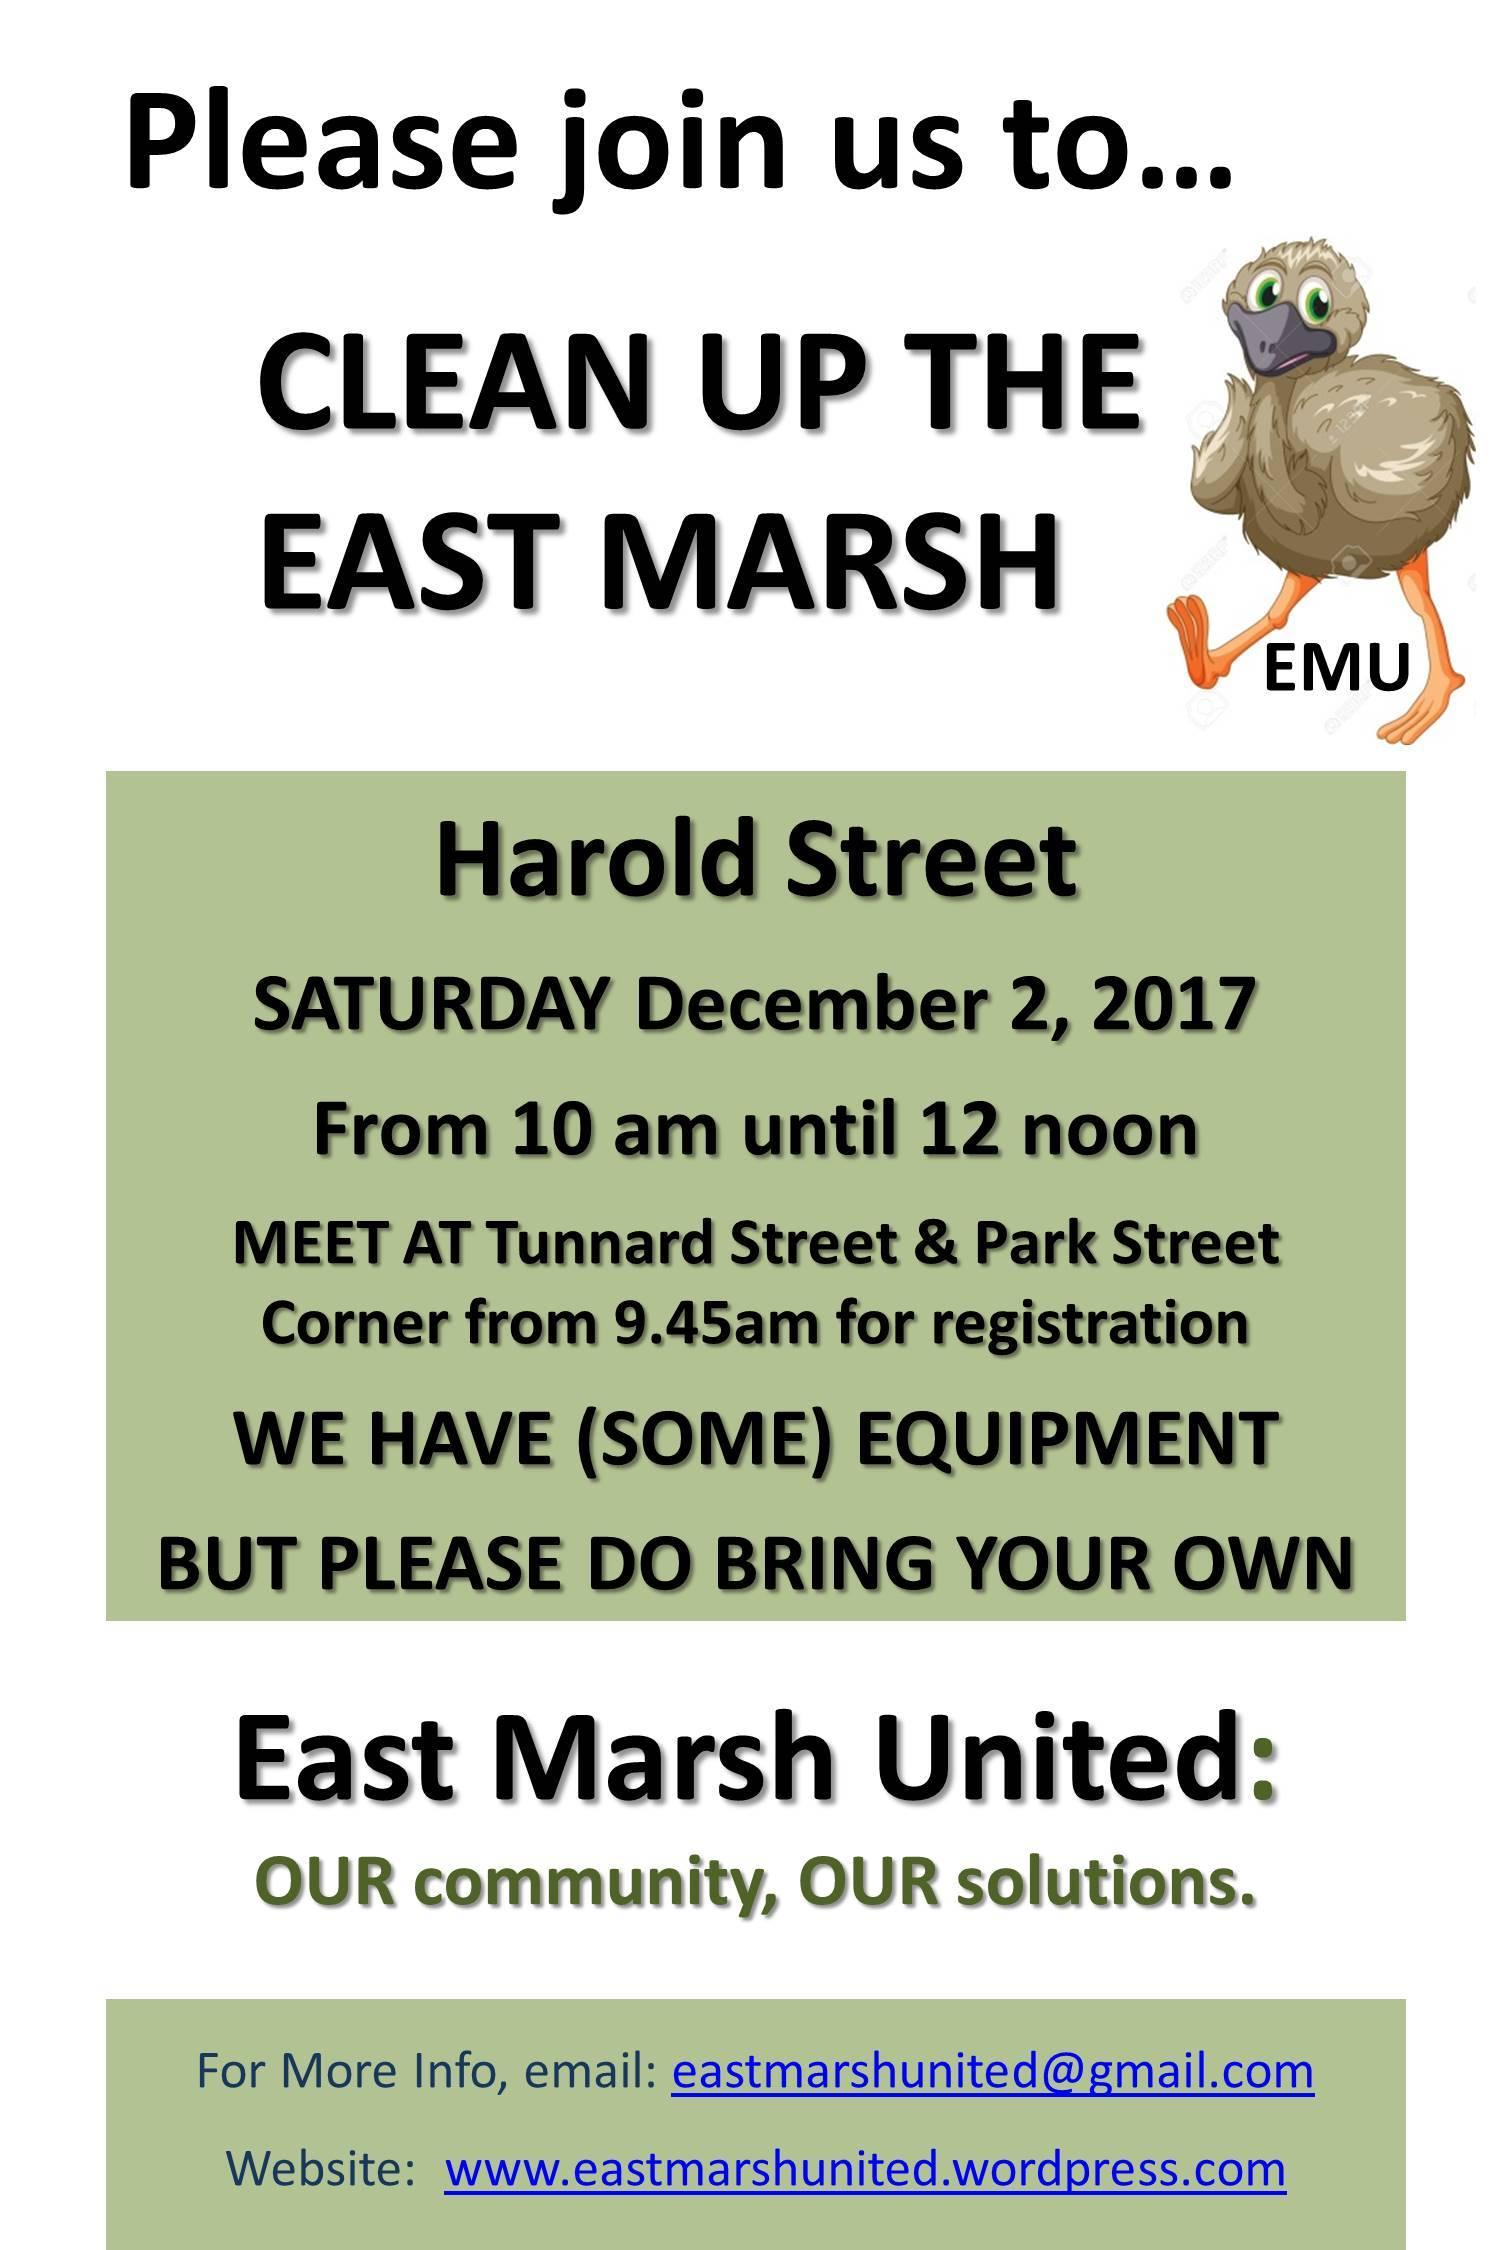 East Marsh United Flyer 2017-11-02 Street Clean - 5 Harold Street